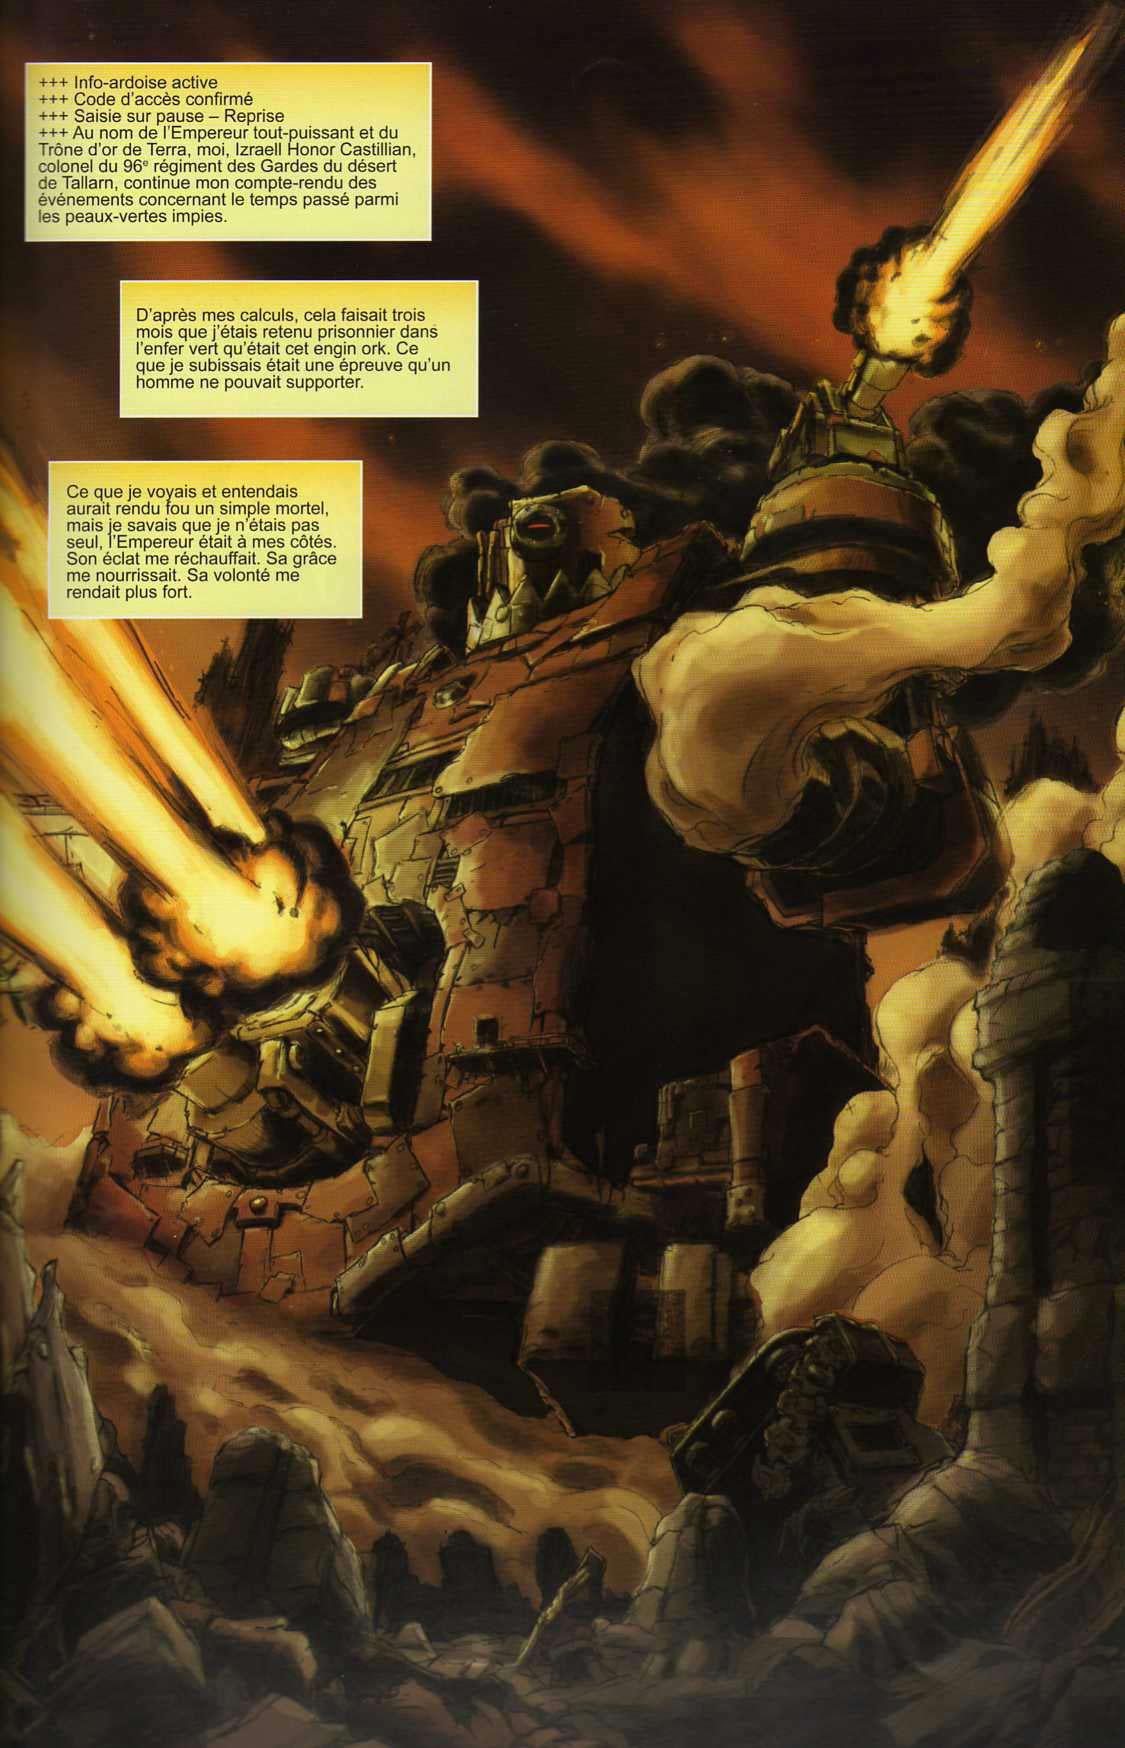 T4 : Le clan des Orks - Warhammer 40.000 (page 1)